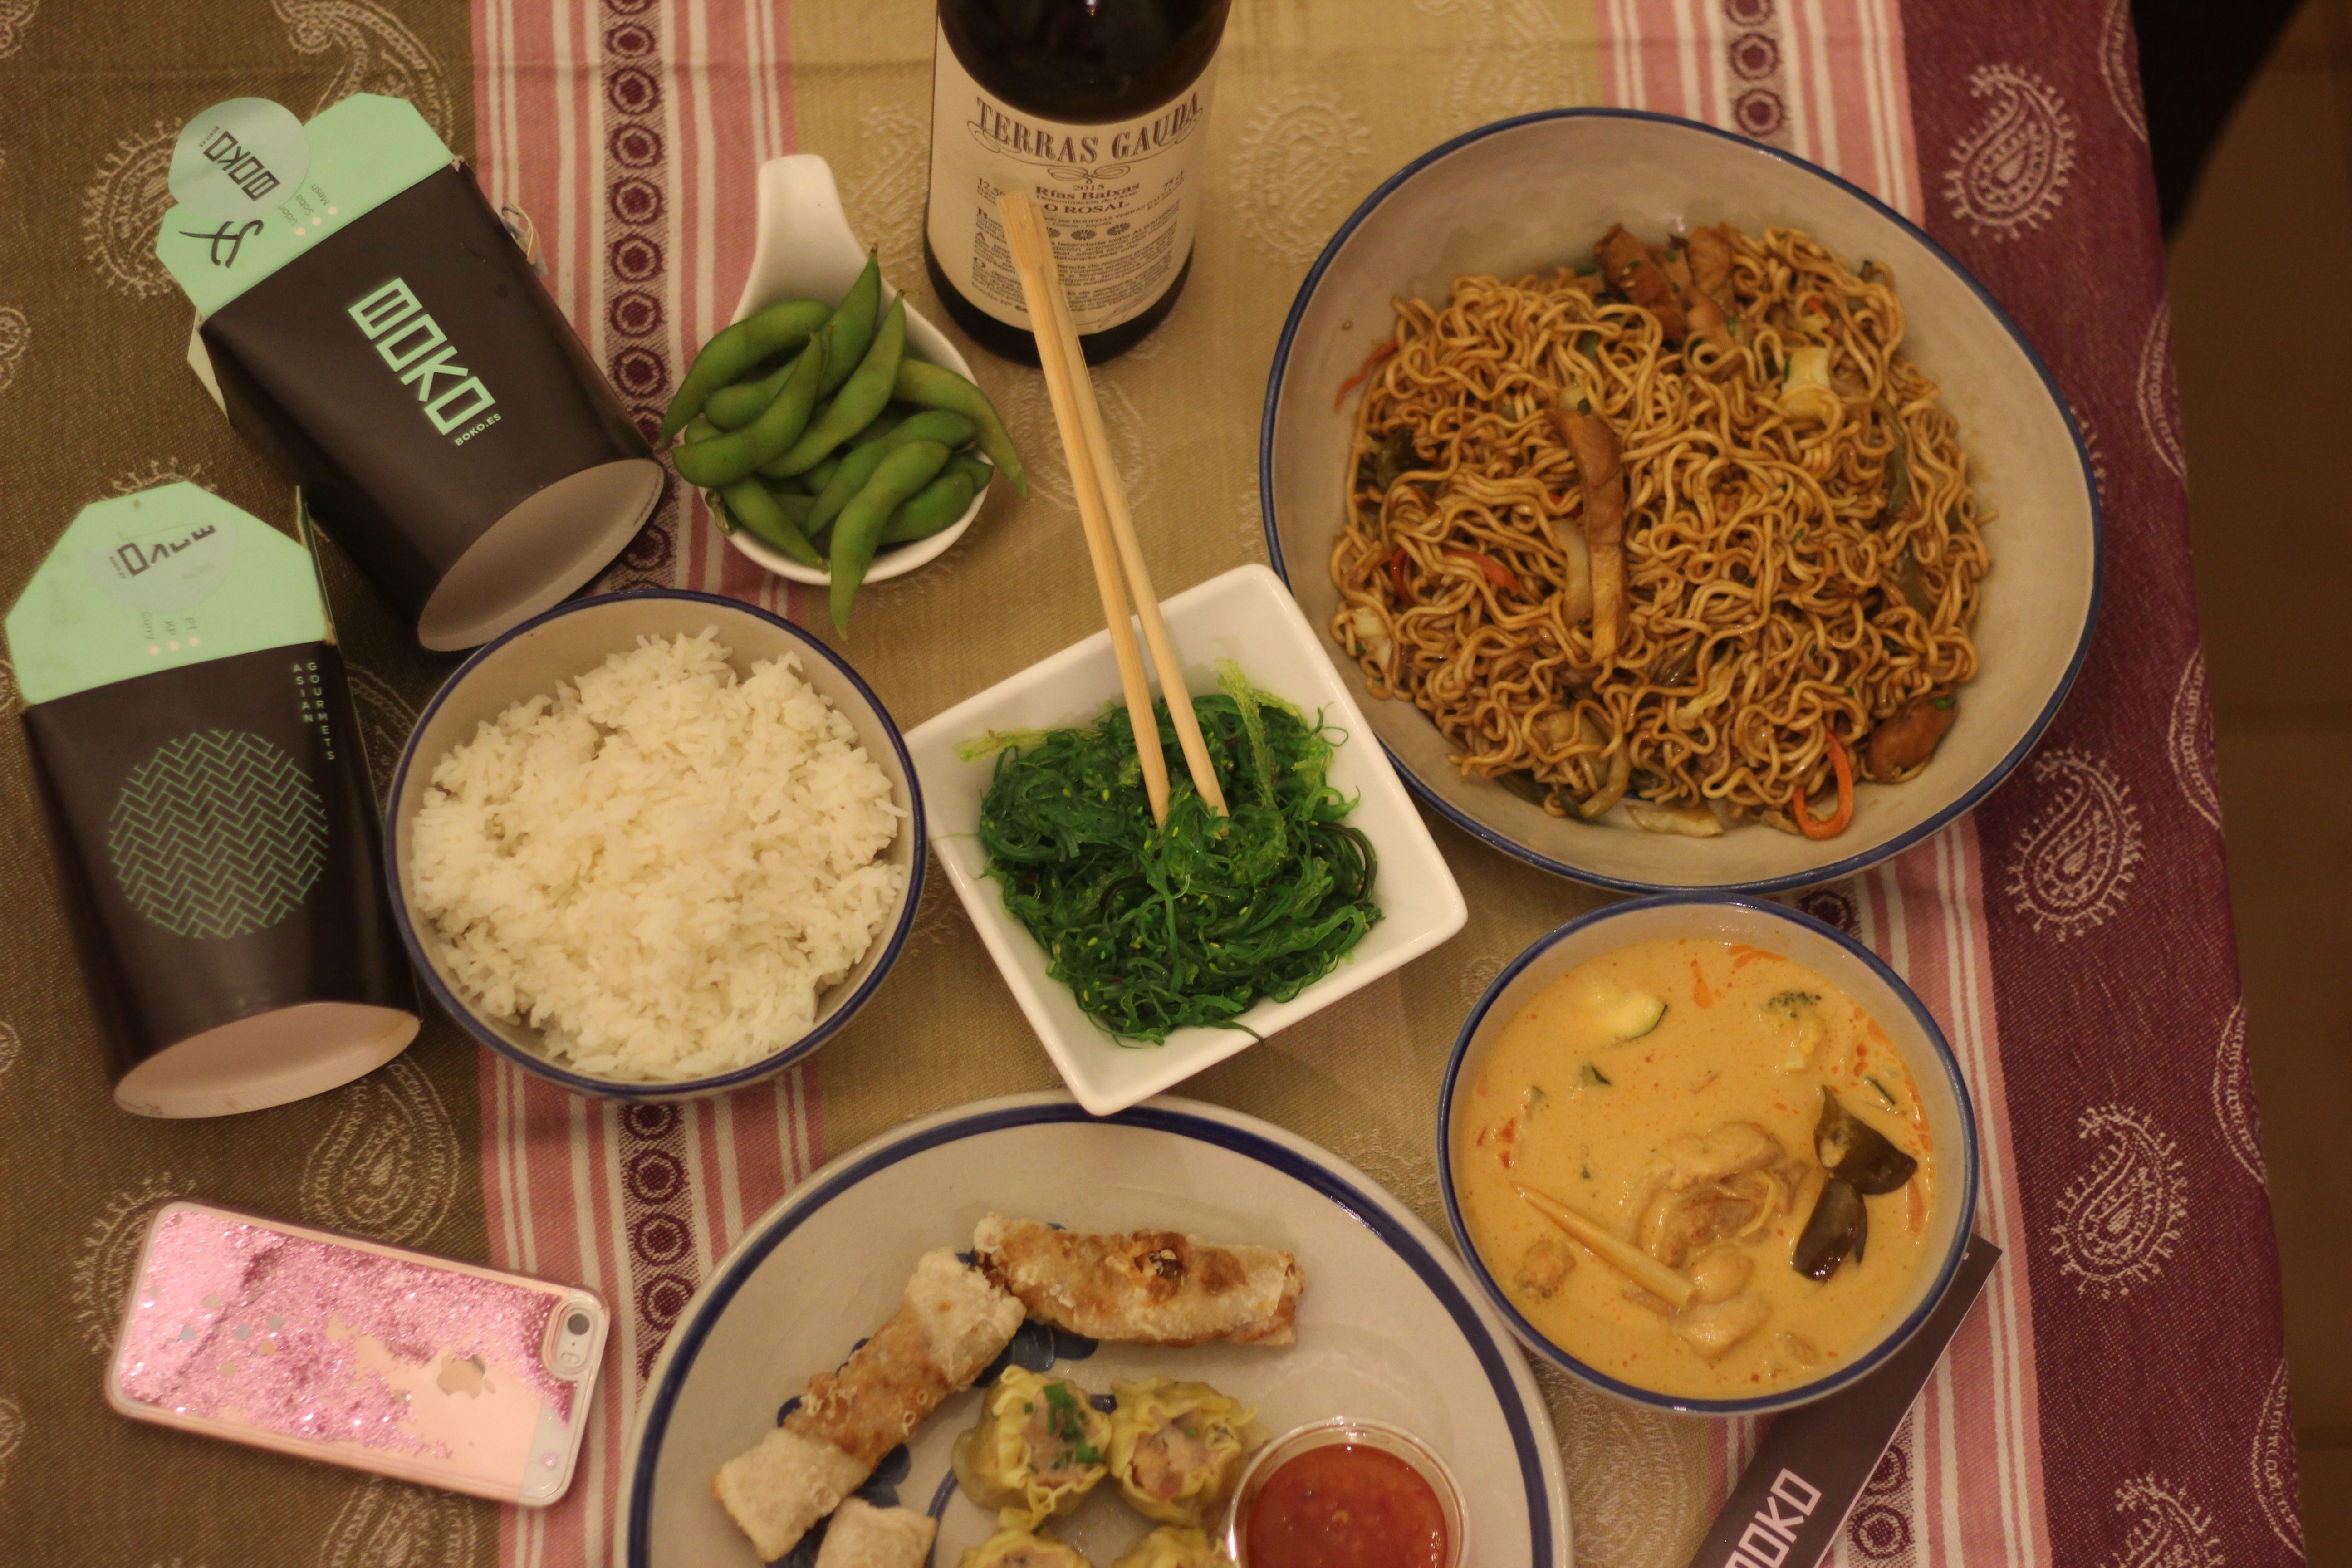 comida-asiatica-delivery-barcelona